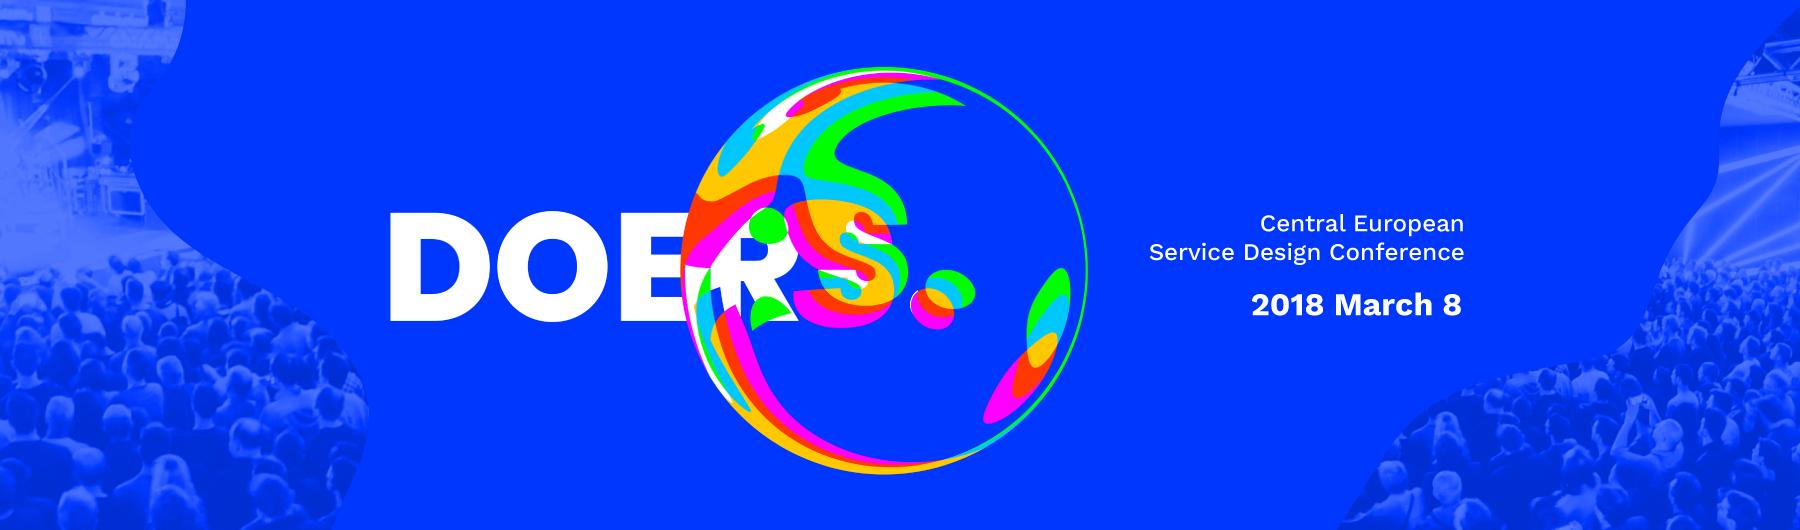 DOERS Central-European Service Design Conference